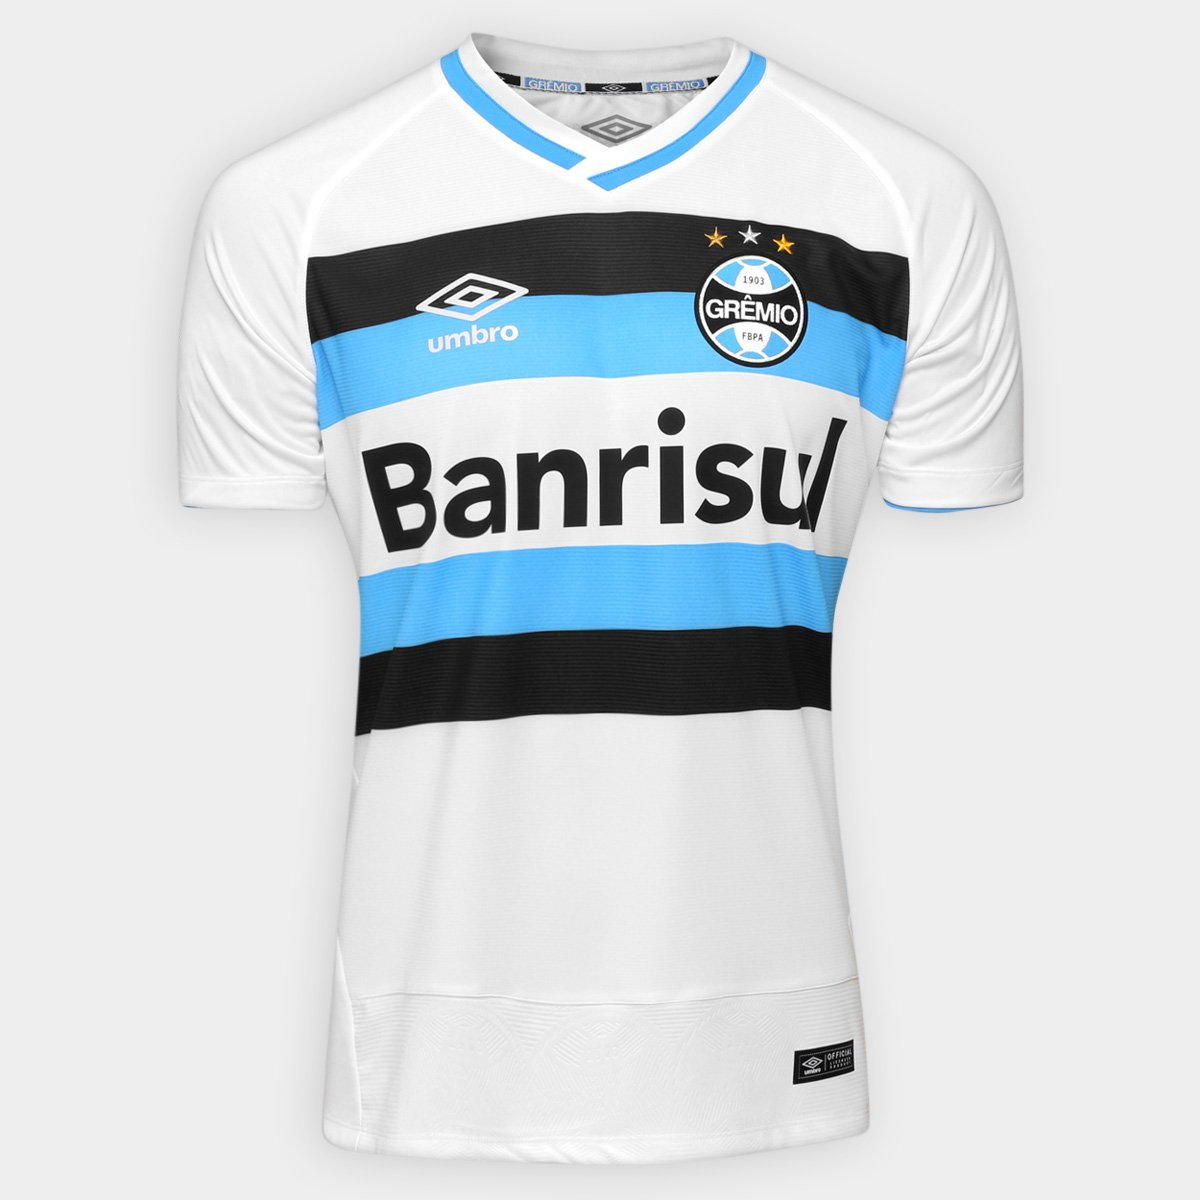 Camisa Grêmio II 2016 s nº - Torcedor Umbro Masculina - Compre Agora ... f61d1a80b82b7